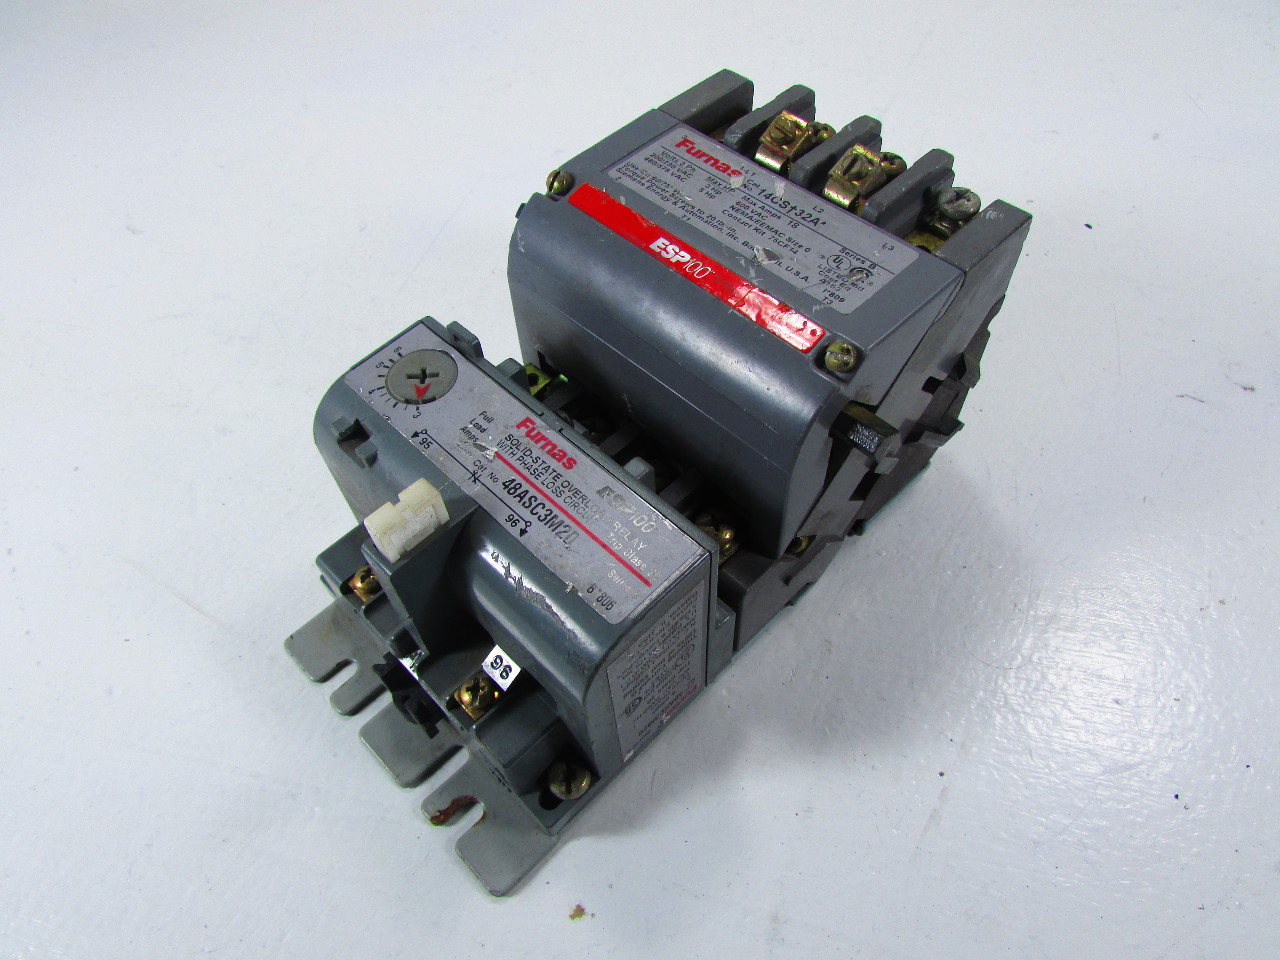 Furnas electric co 48asc3m20 esp100 starter ebay Furnas motor starter